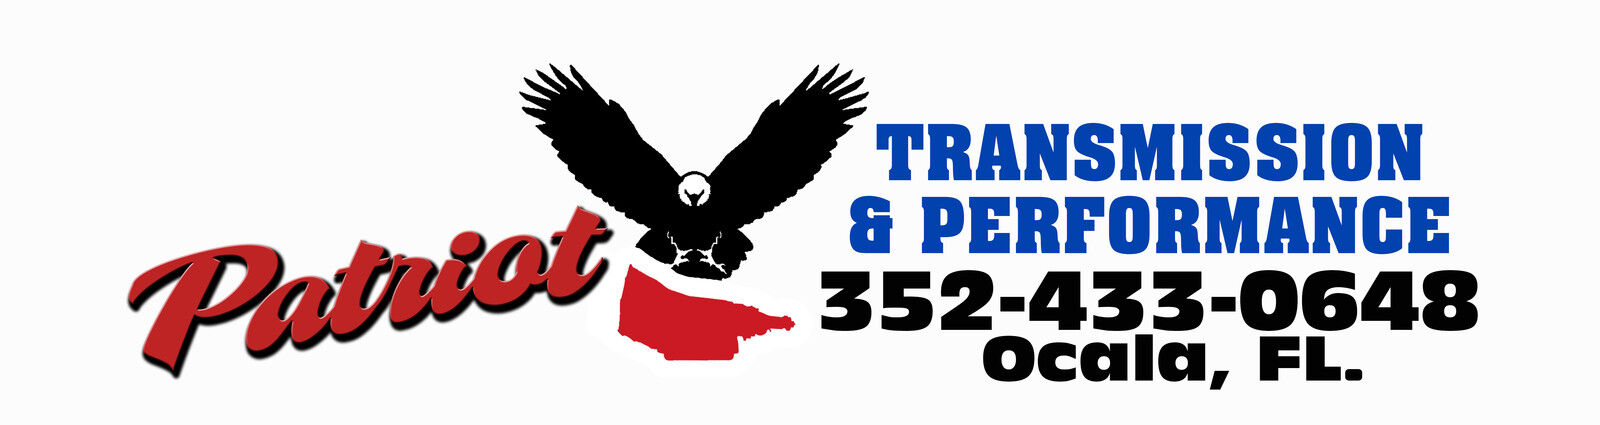 Patriot Transmission Ocala Florida